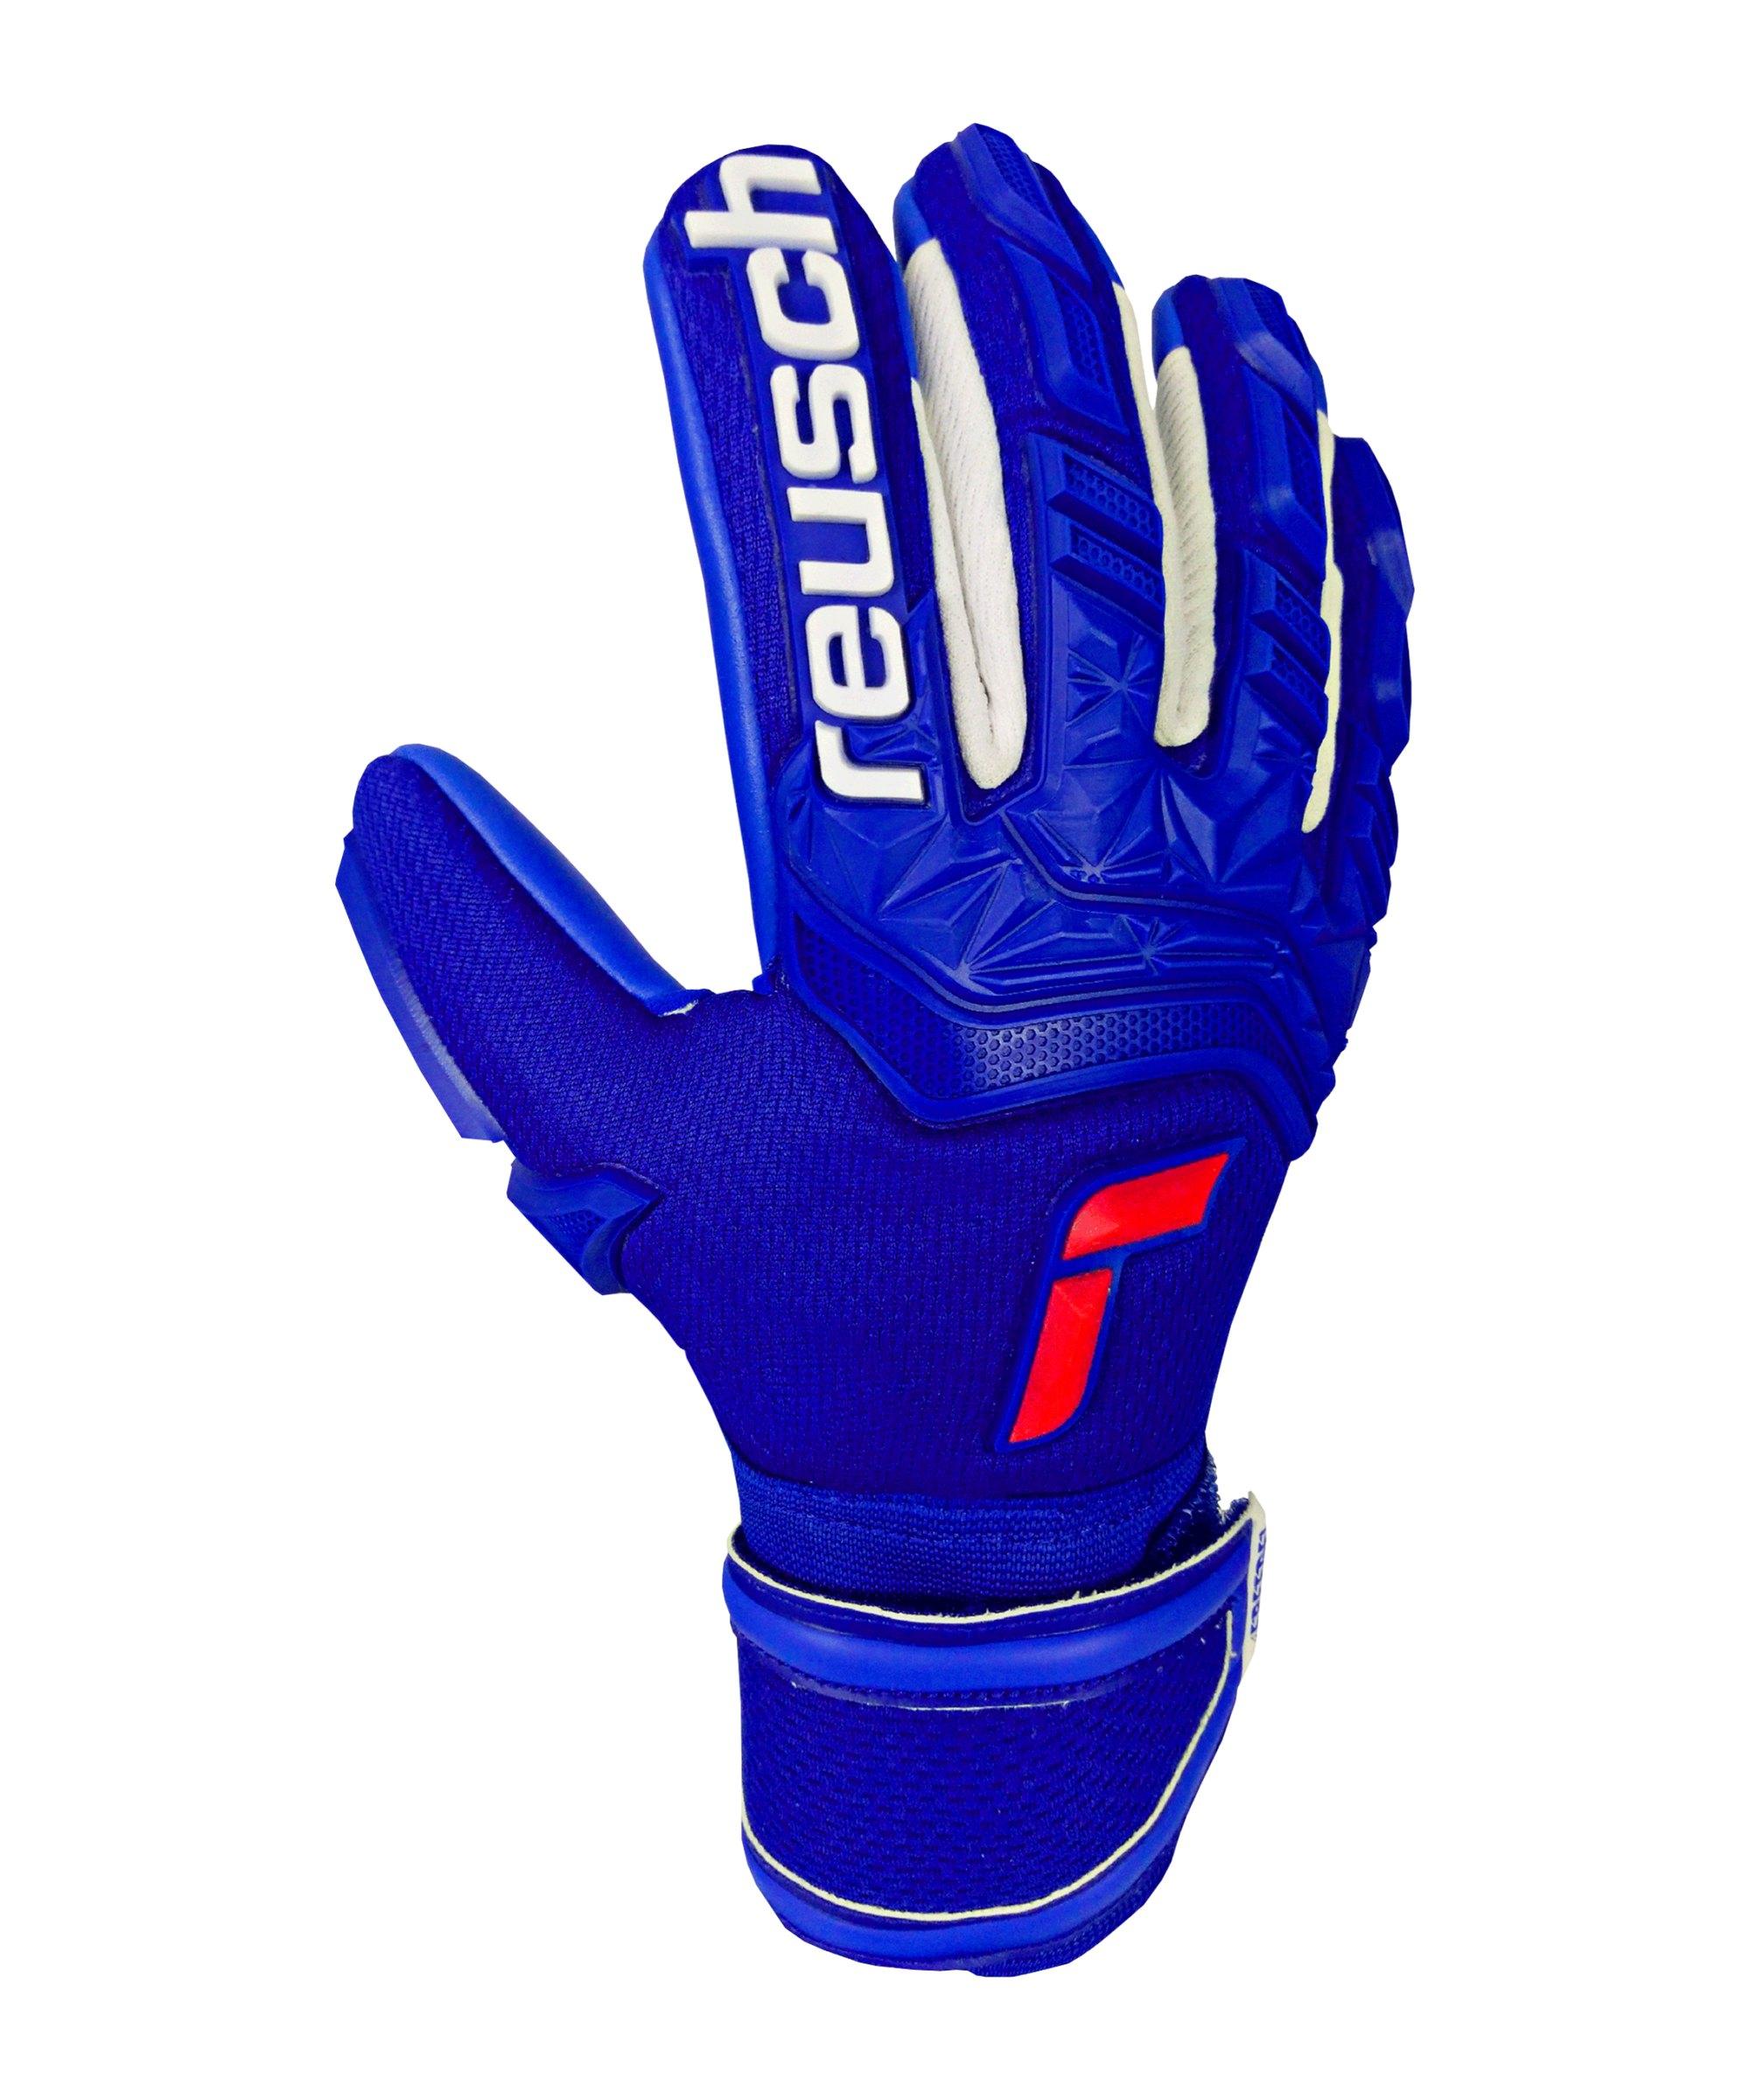 Reusch Attrakt Freegel TW-Handschuh Junior F4010 - blau